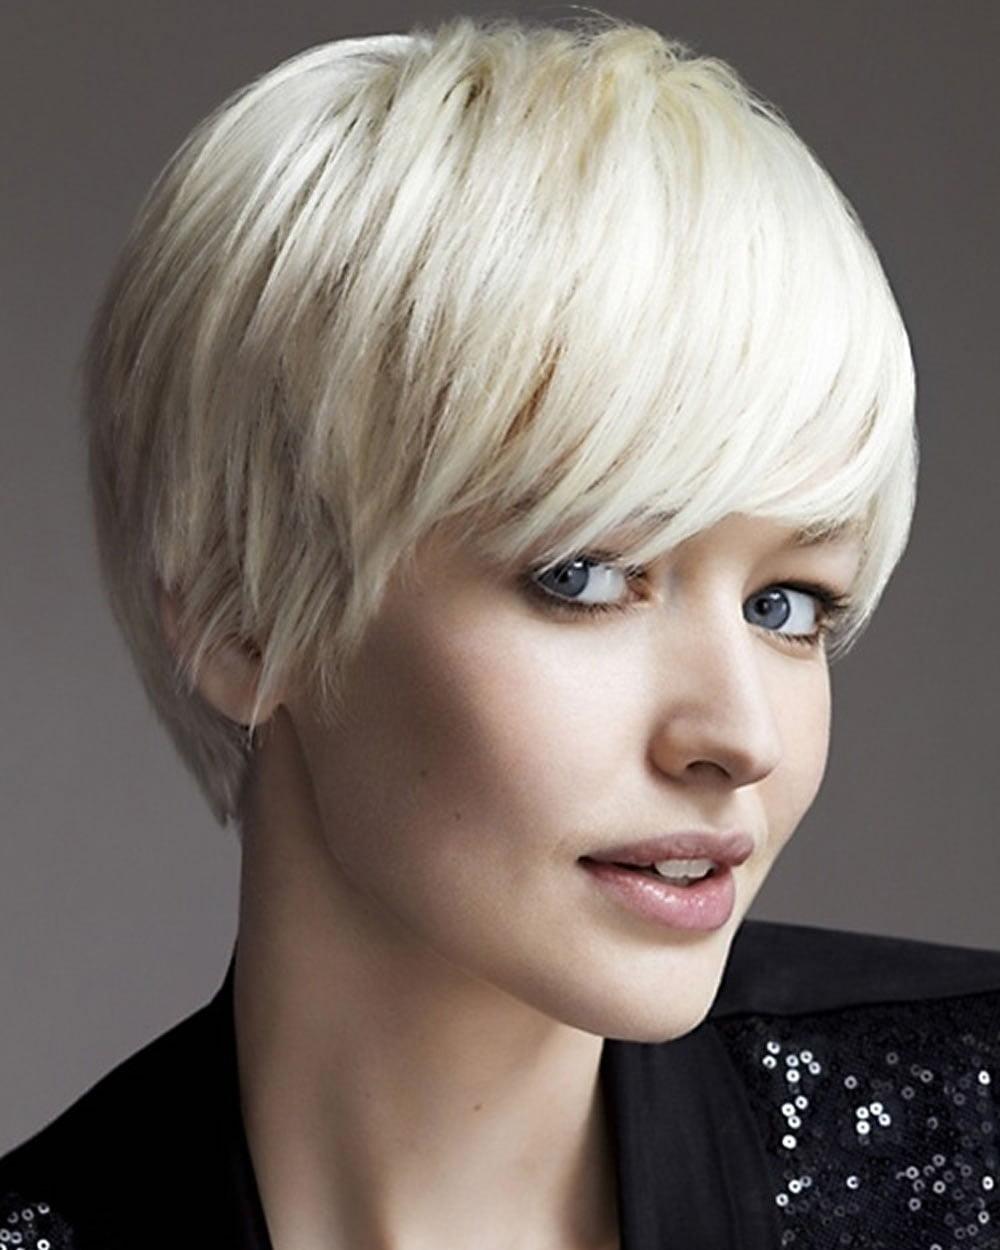 23 Trend Ultra Short Hairstyle Ideas & Very Short Pixie Hair Cut ...